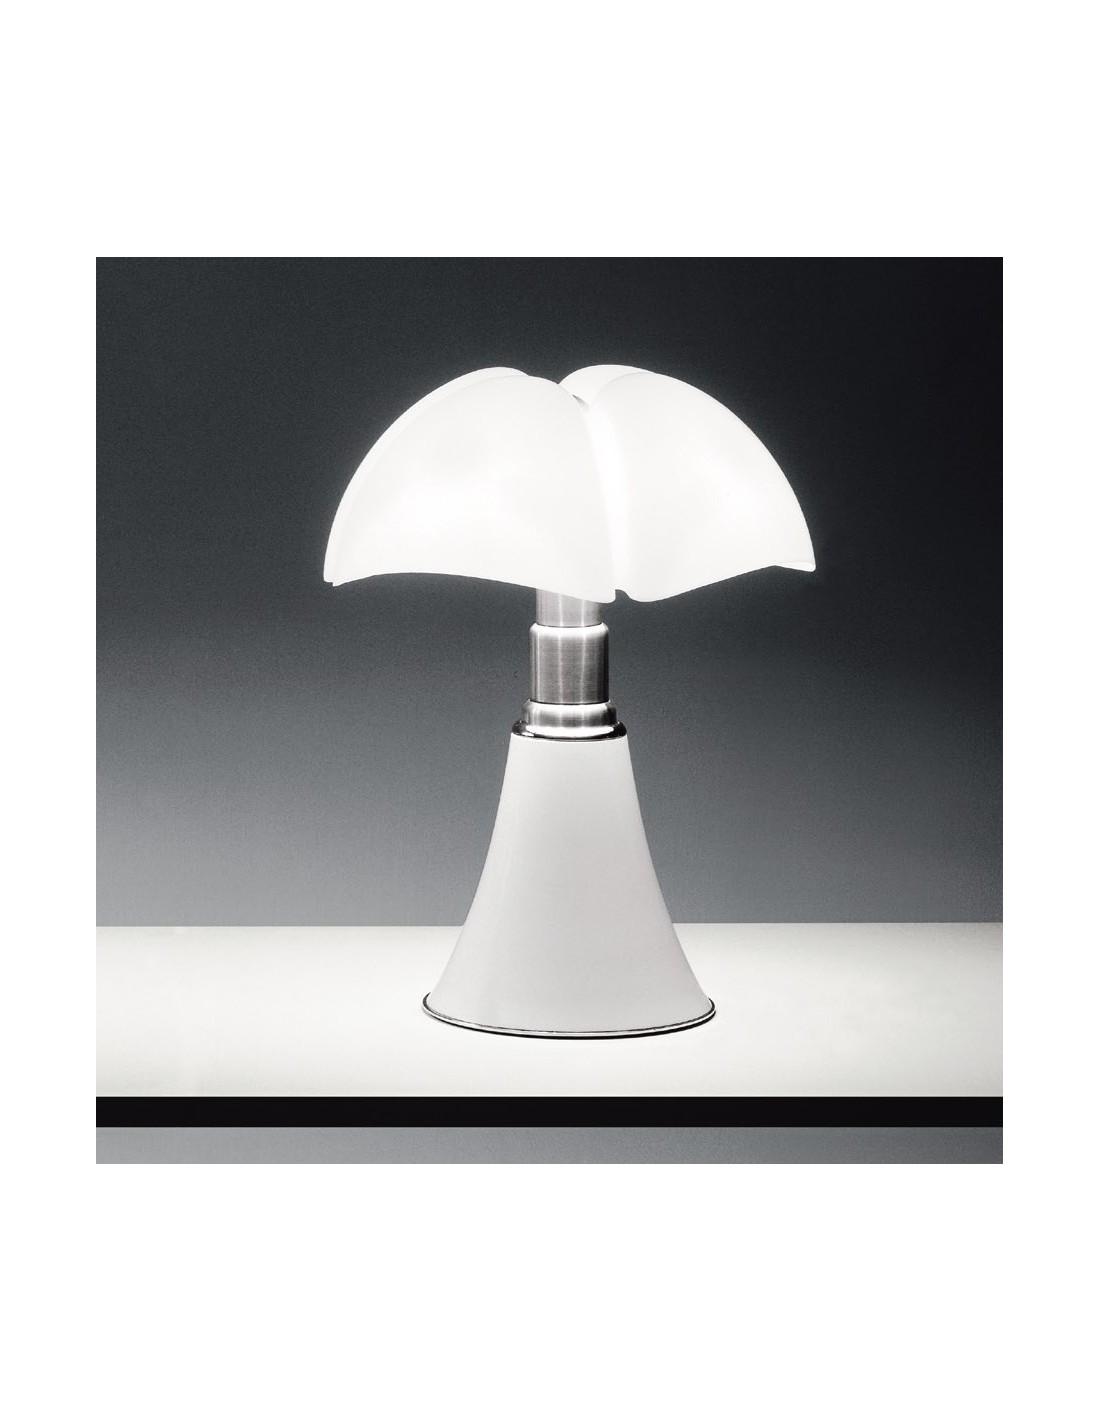 lampe de table pipistrello blanche mise en situation. Black Bedroom Furniture Sets. Home Design Ideas